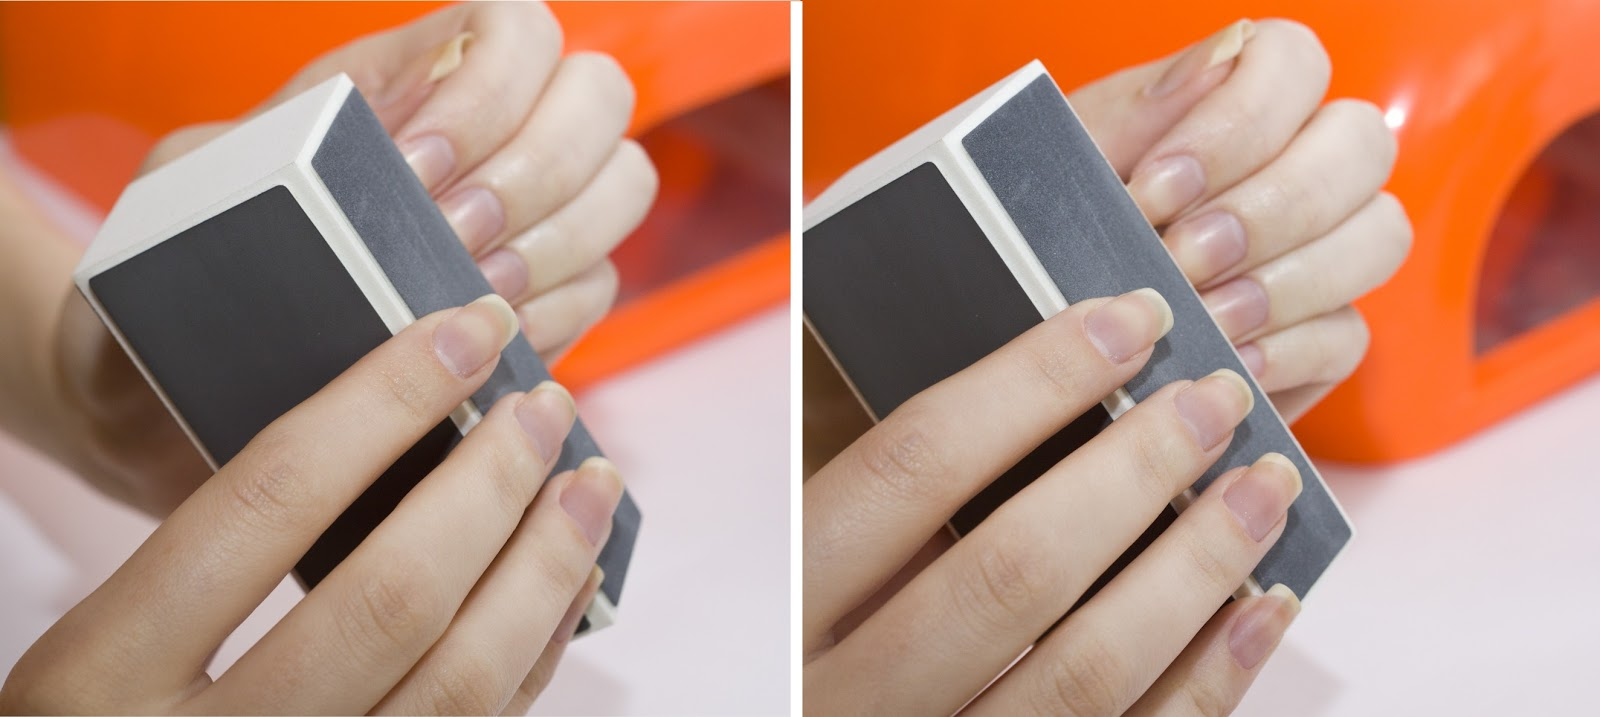 Чем обезжирить ногти перед гелем в домашних условиях